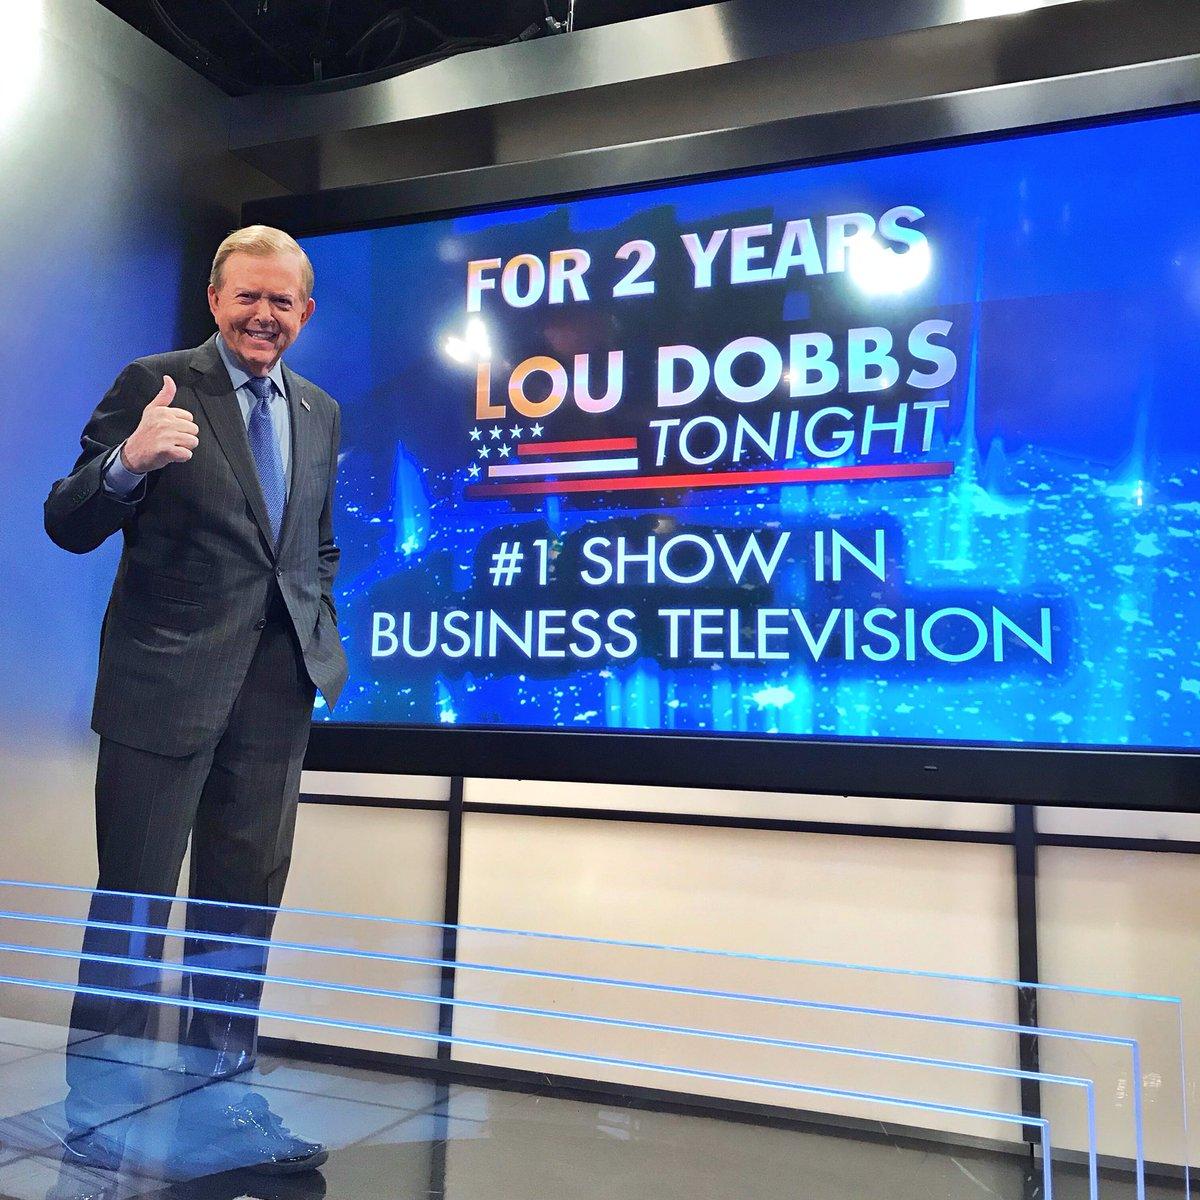 All thanks to my loyal viewers! #MAGA #Dobbs #TrumpTrain